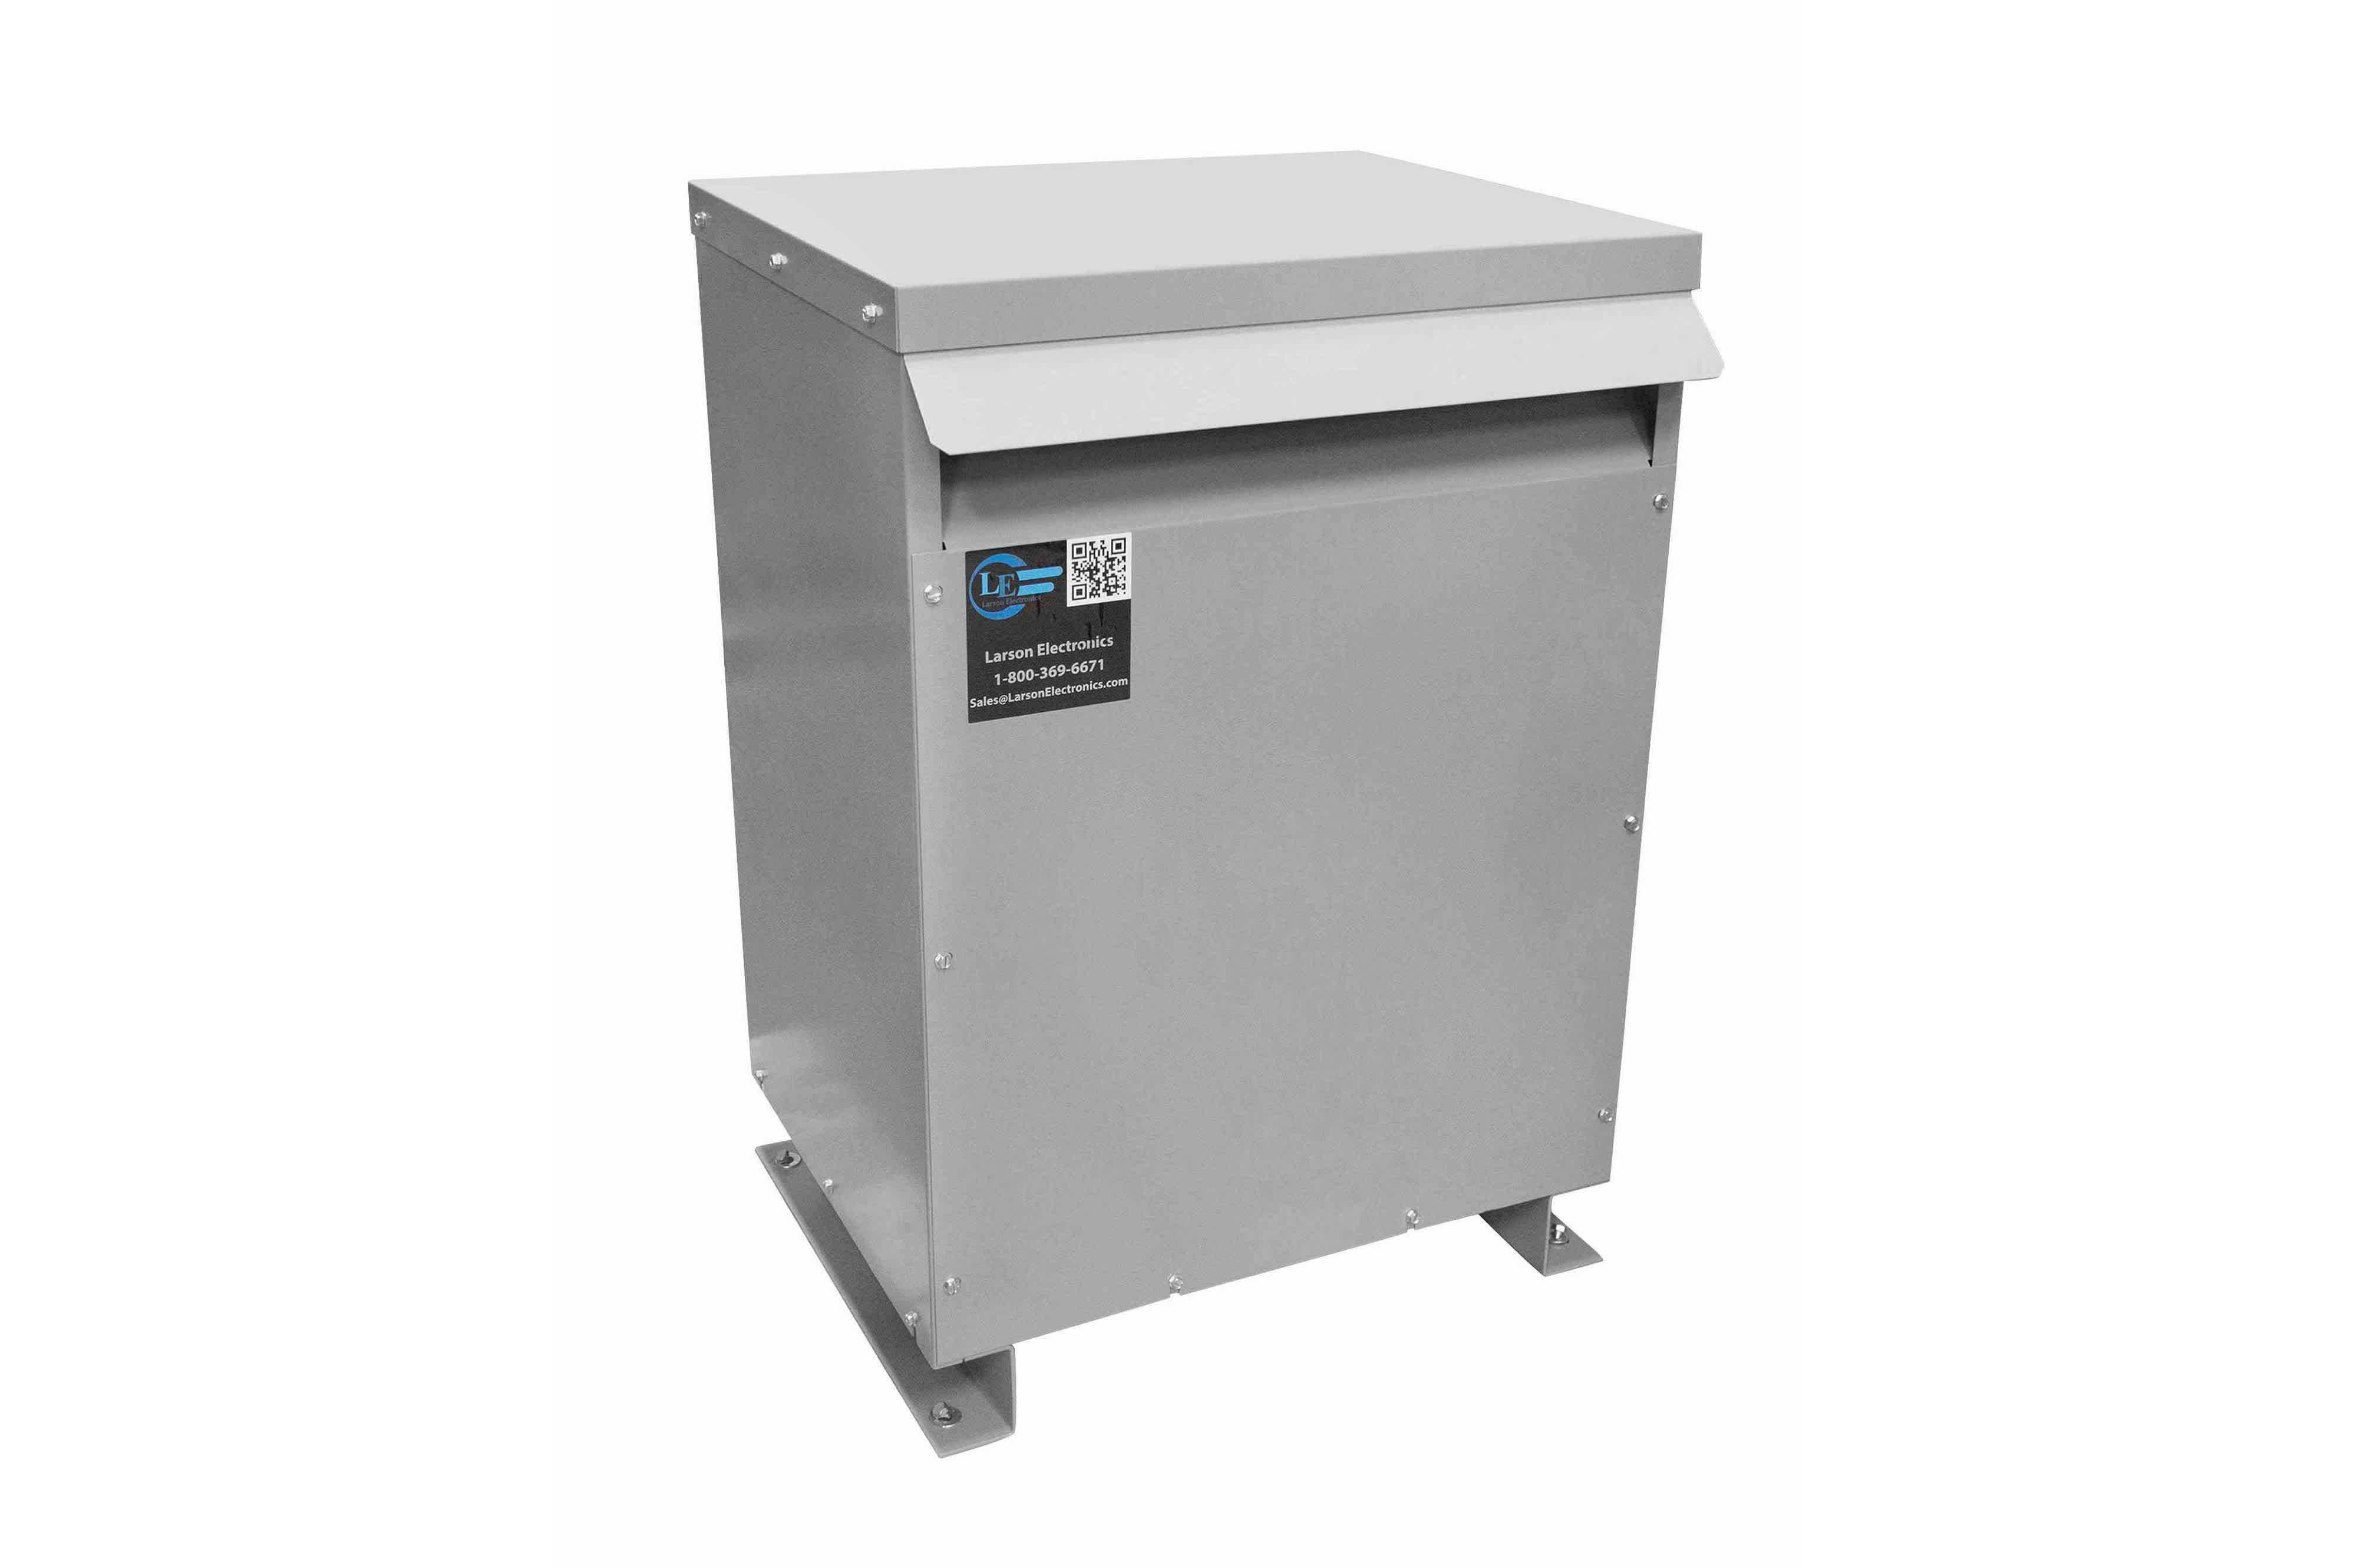 37.5 kVA 3PH DOE Transformer, 208V Delta Primary, 480Y/277 Wye-N Secondary, N3R, Ventilated, 60 Hz